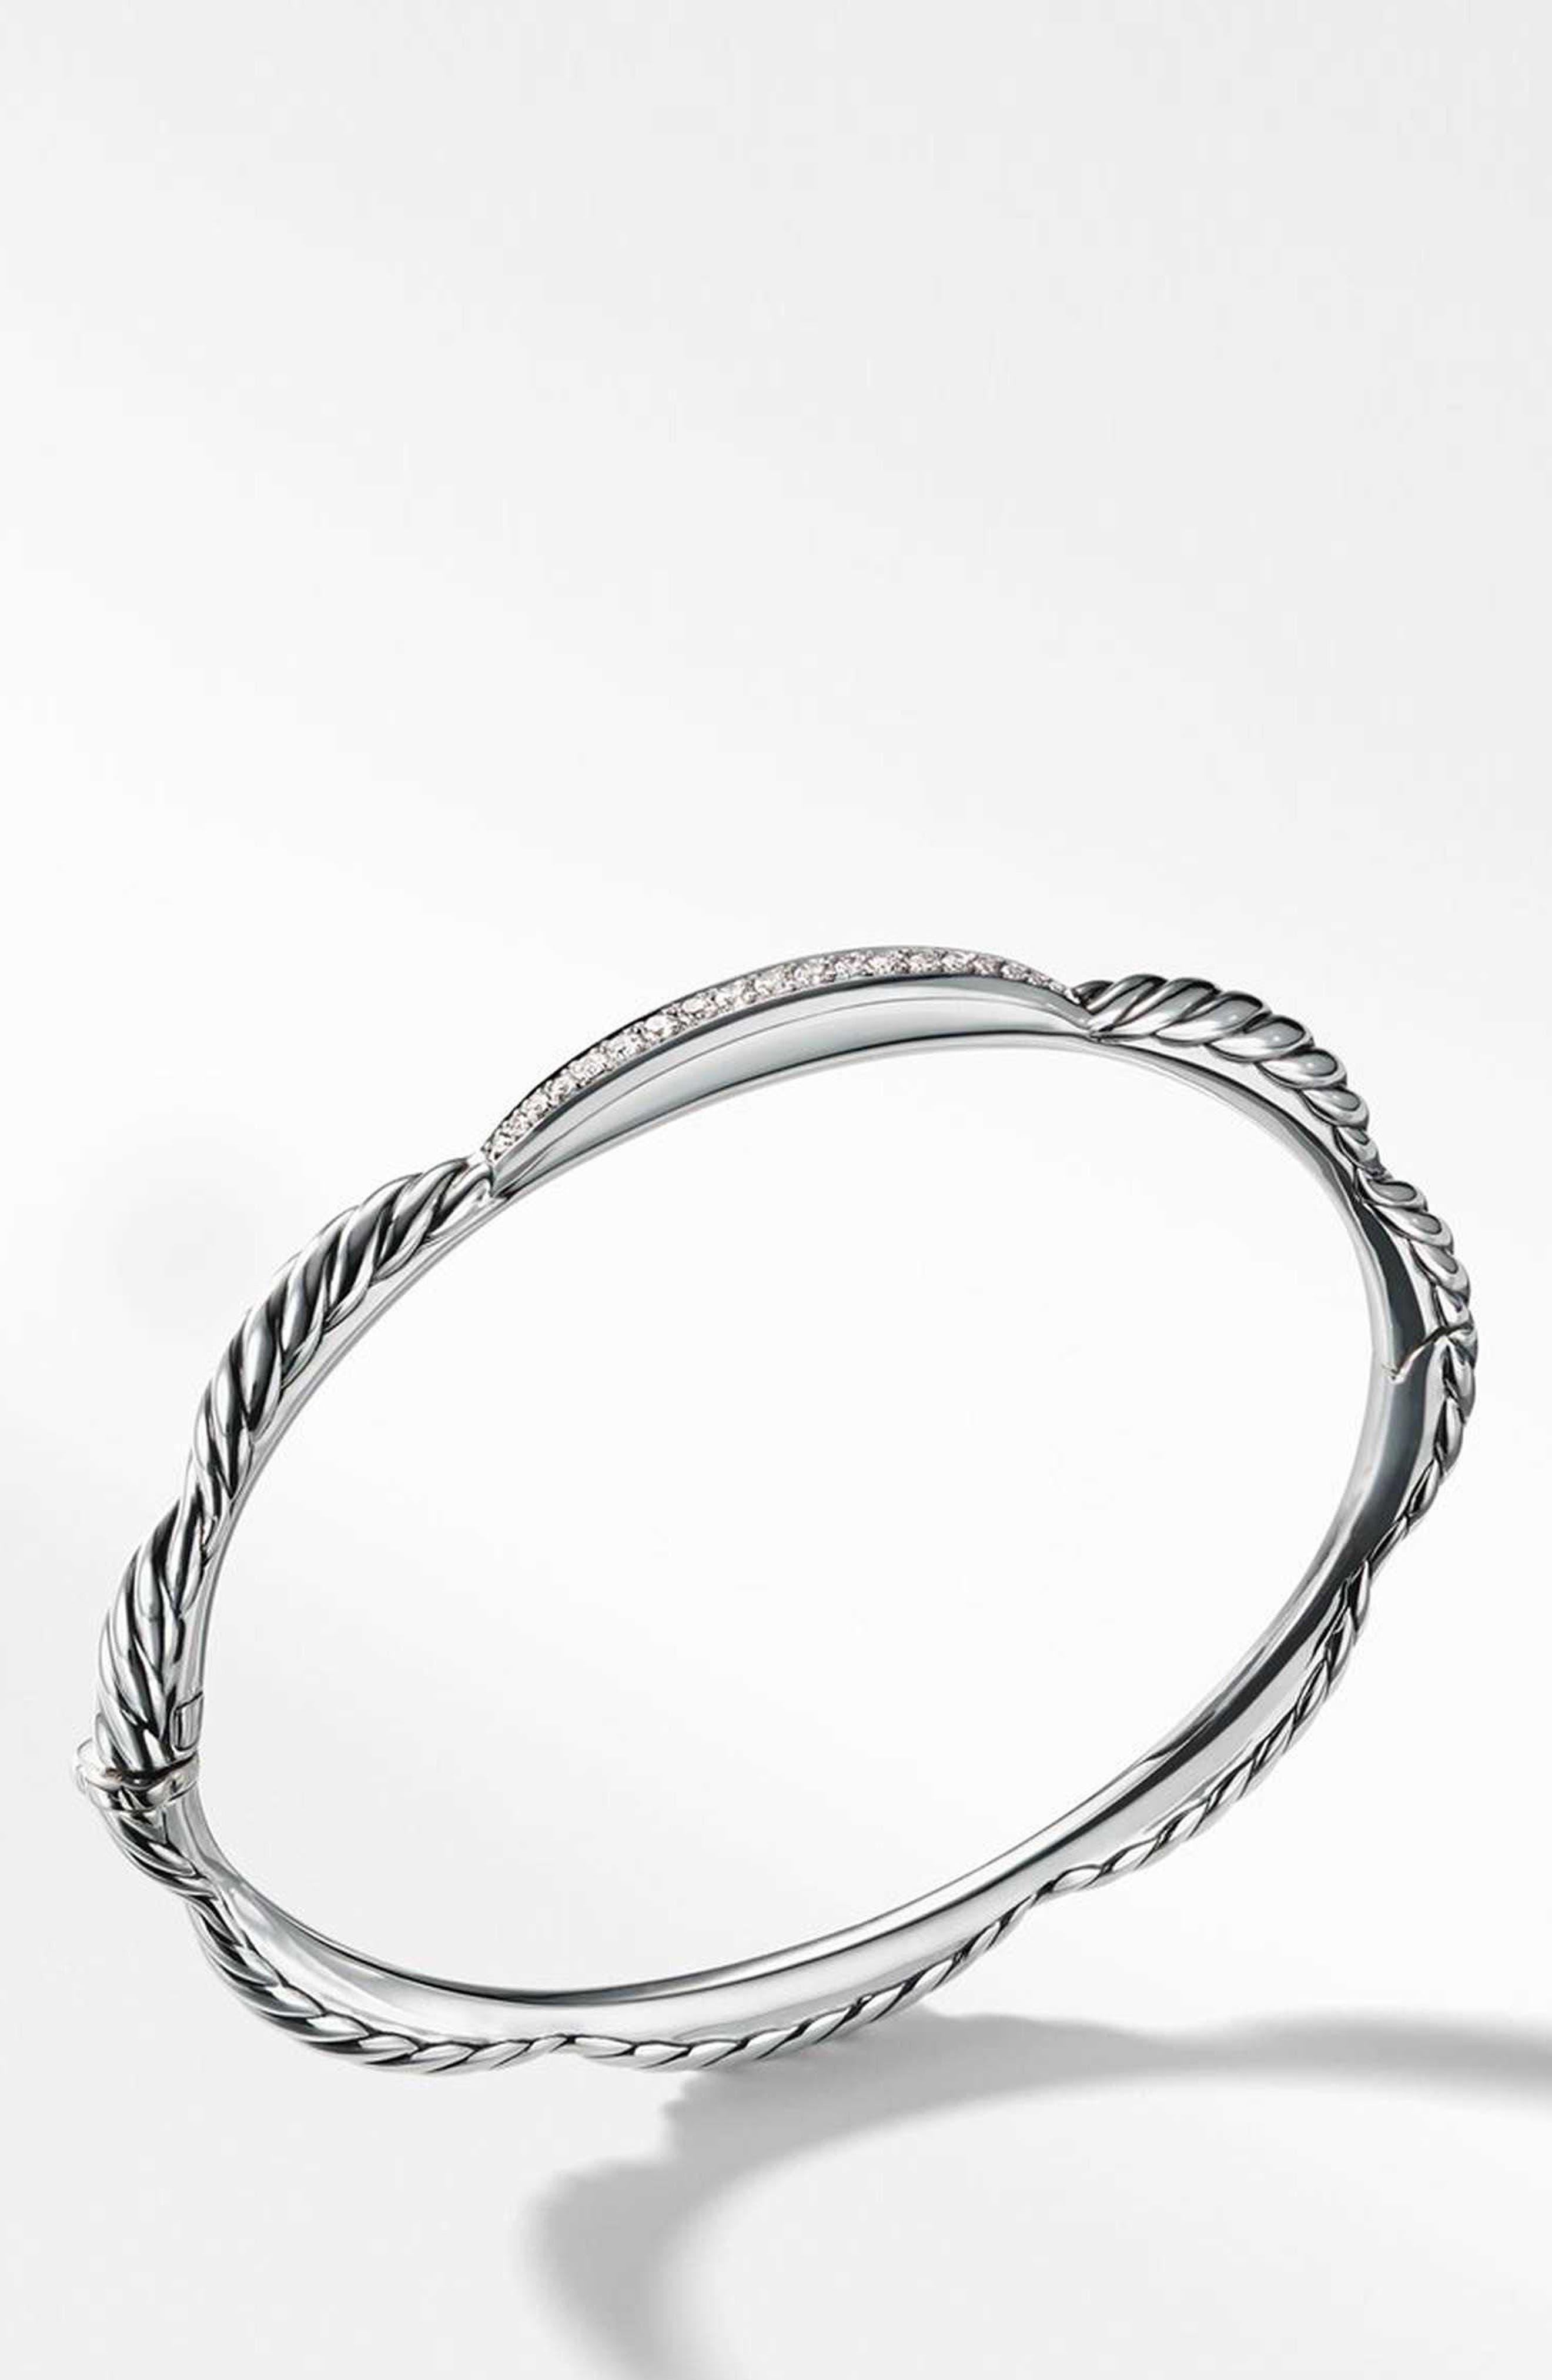 Tides Single Station Bracelet with Diamonds,                             Alternate thumbnail 2, color,                             STERLING SILVER/ DIAMOND